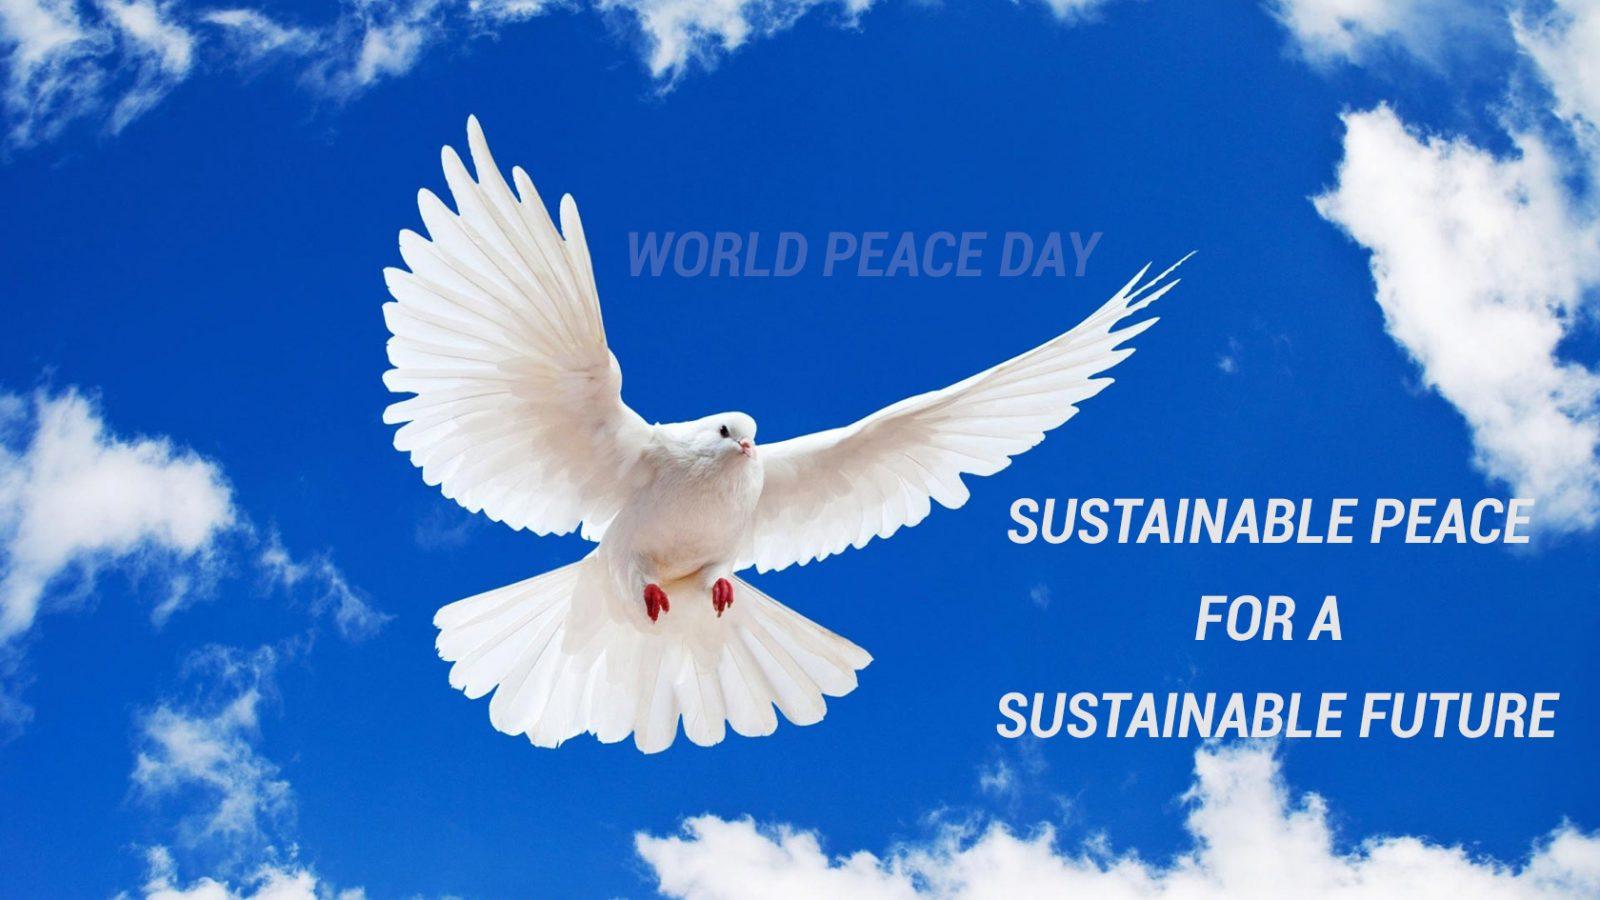 International World Peace Day Dove 4K Uhd Wallpaper   HD 1600x900